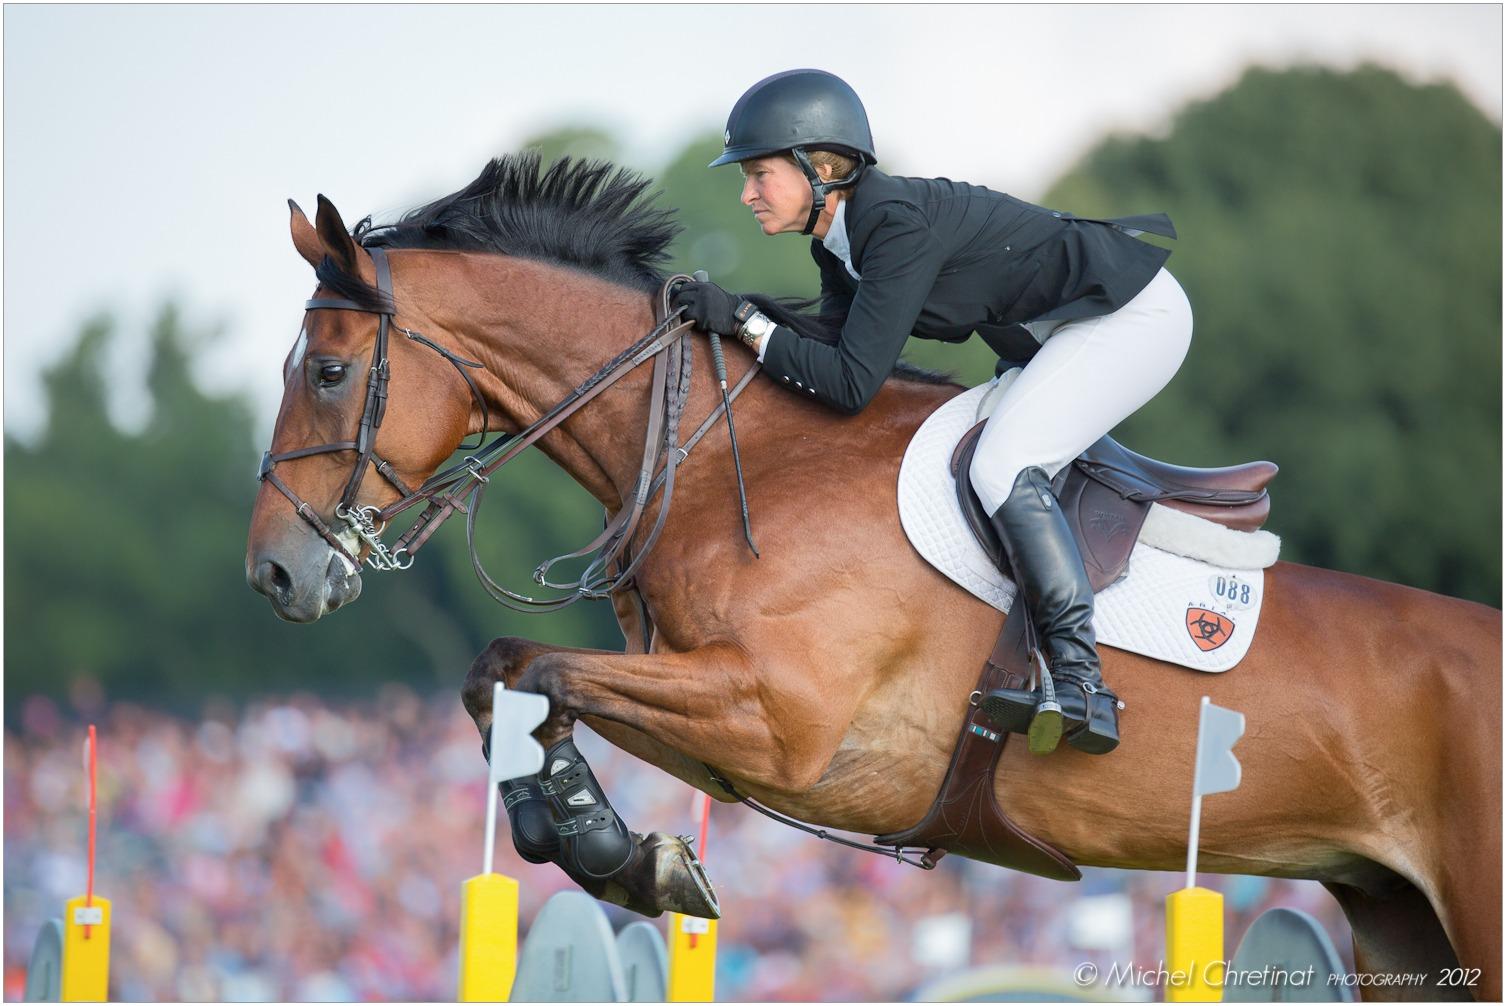 Showjumping Legend: Beezie Madden - photo Michel Chretinat - Globetrotting horse riding holidays